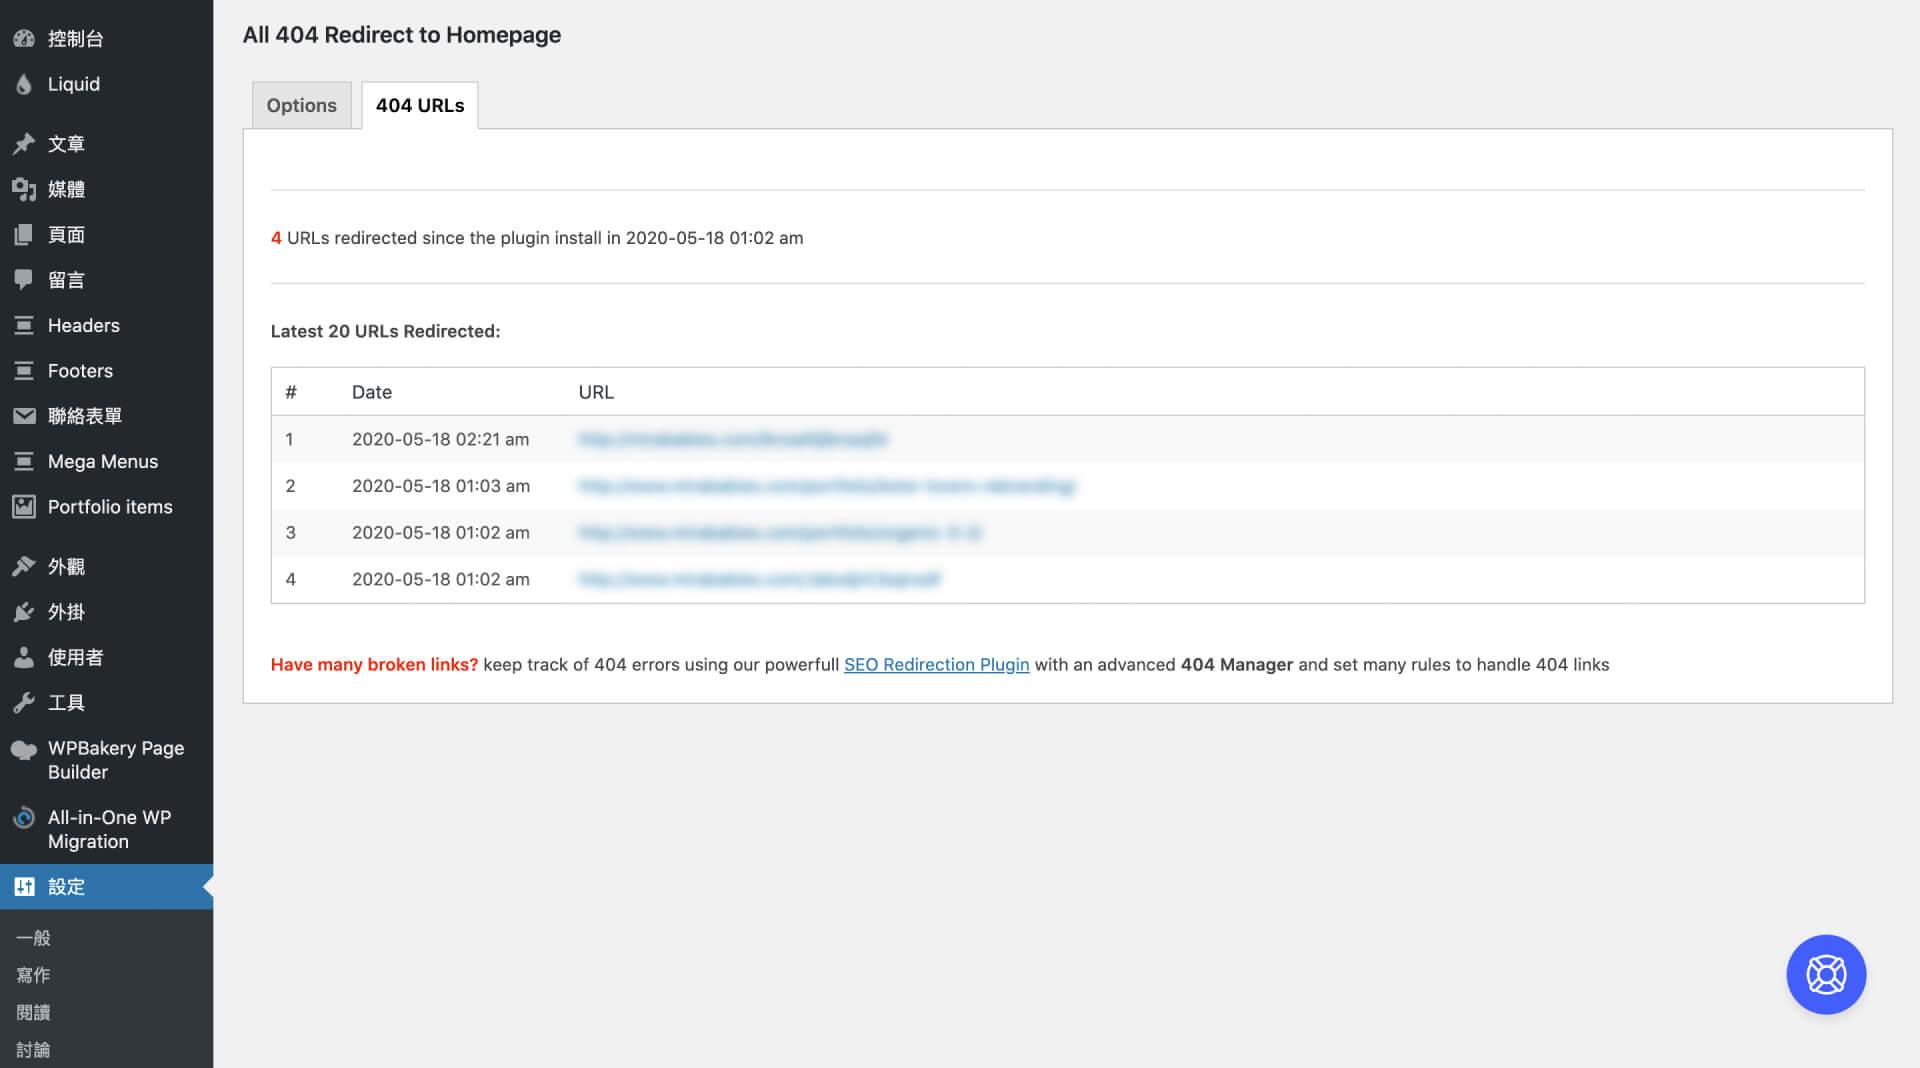 All 404 Redirect to Homepage 外掛設定介面 — 編輯區:404 URLs-IrvingLab 爾文實驗室